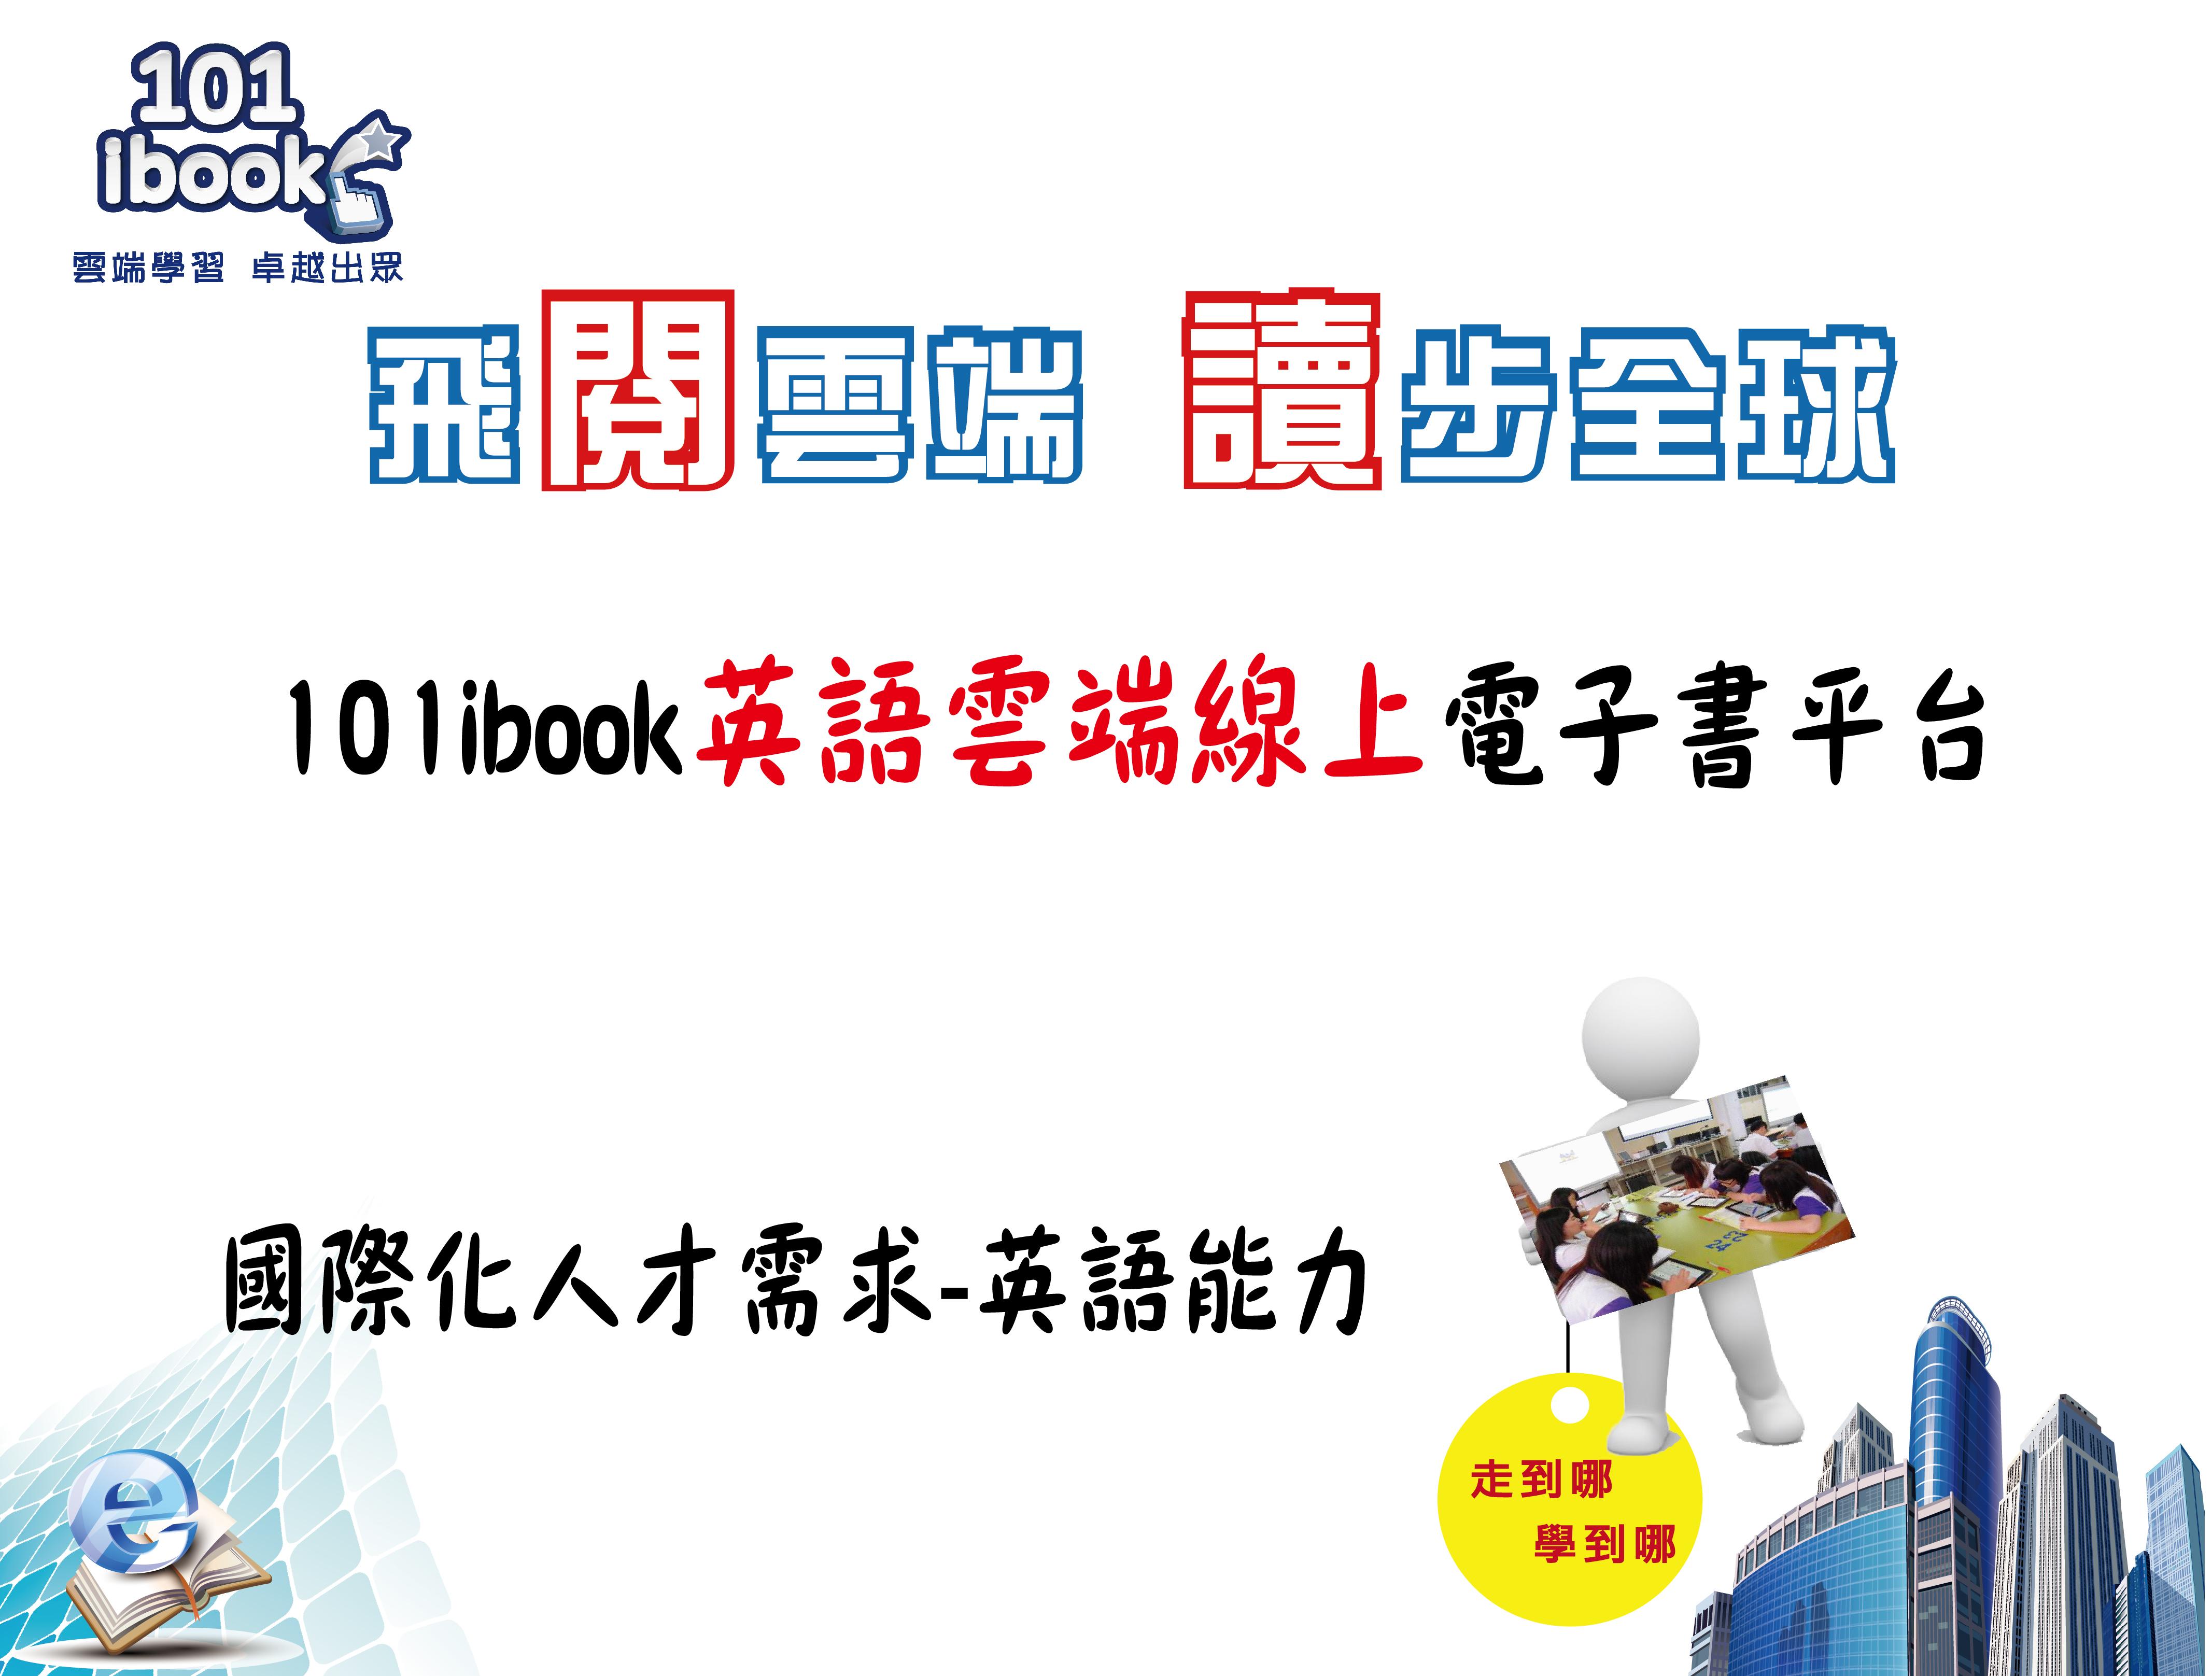 101ibook雲端圖書館介紹1